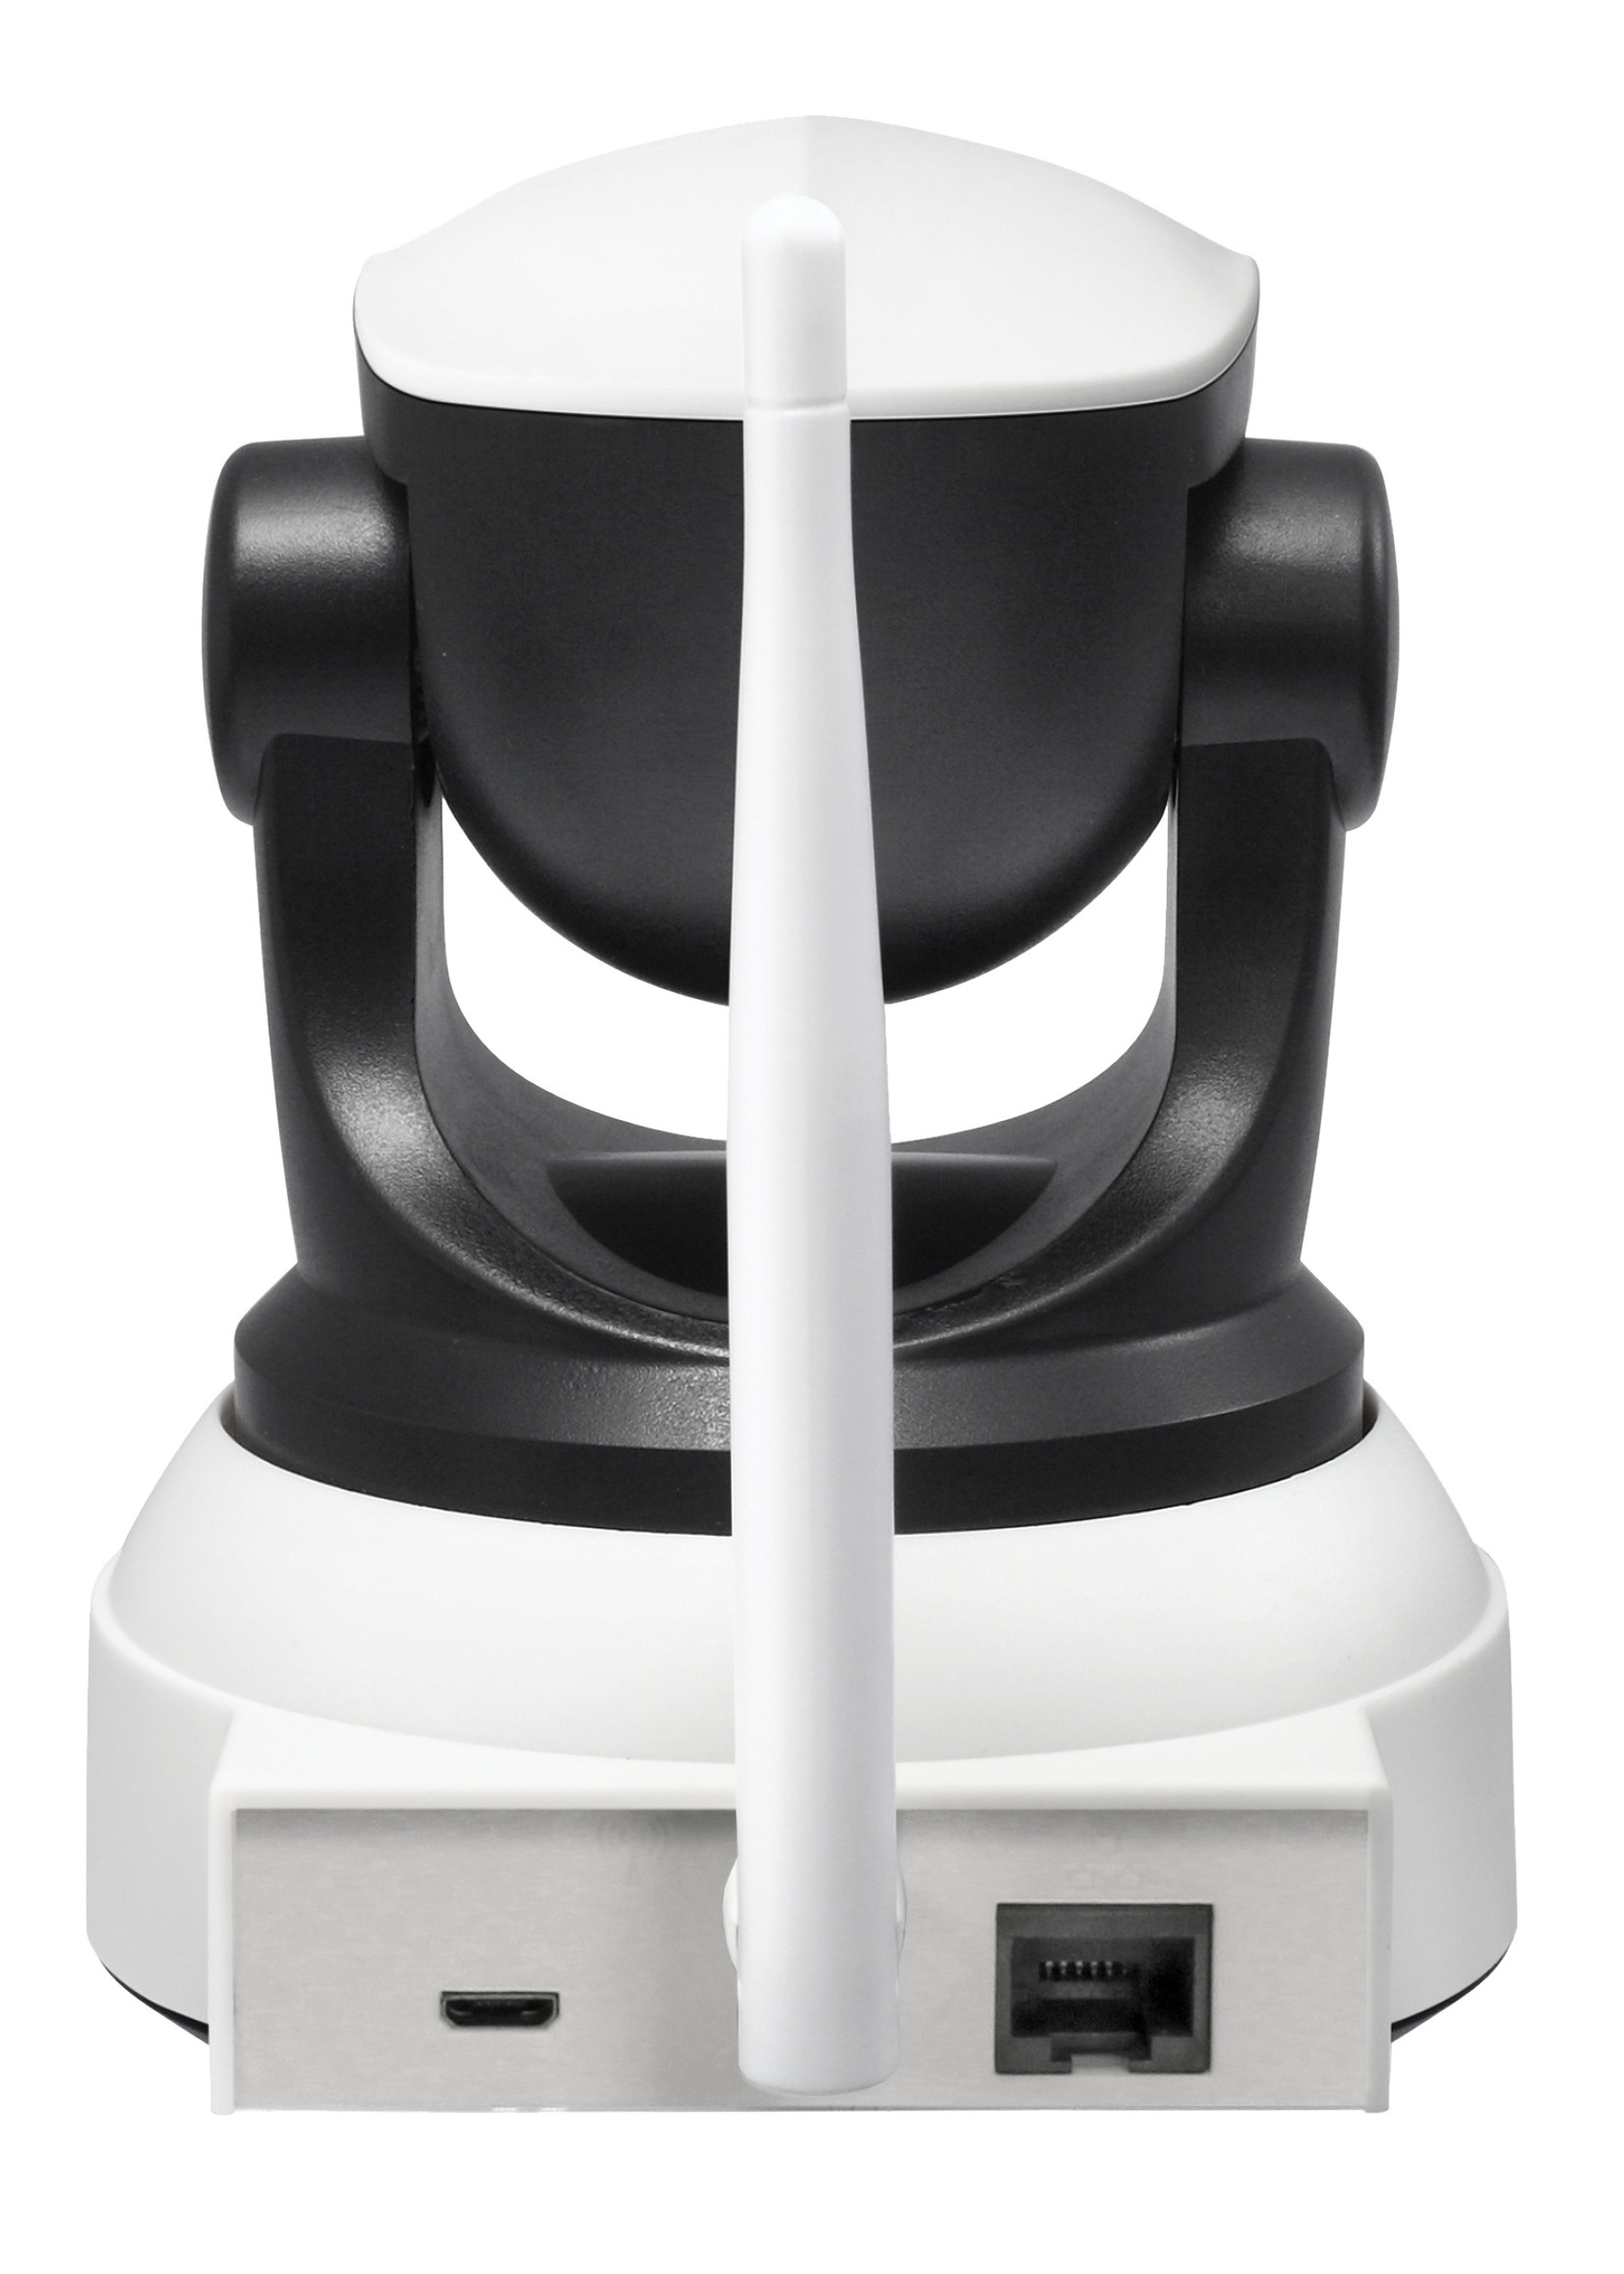 Ultralink Smart Home 360deg WiFi Pan/Tilt